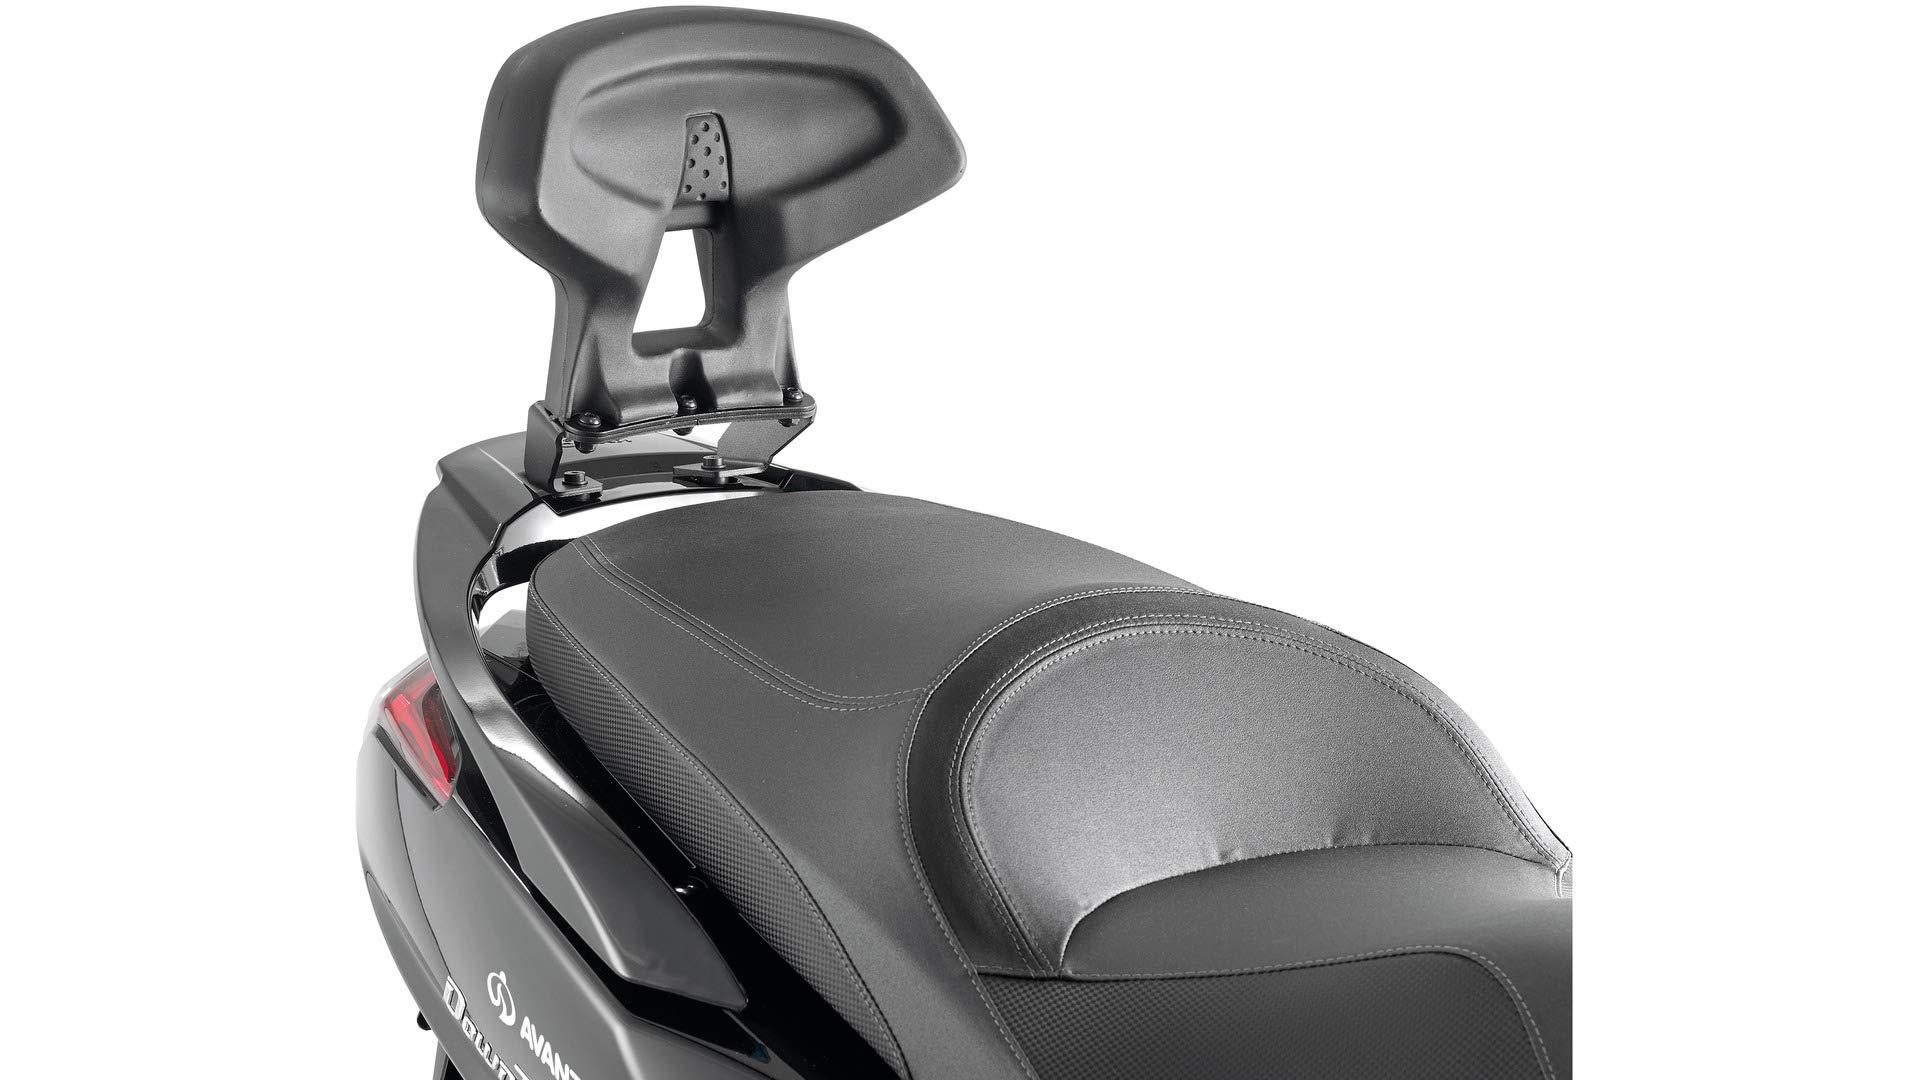 Givi KTB5600 Respaldo del Copiloto para Piaggio Mp3 Yourban 125-300 11  15